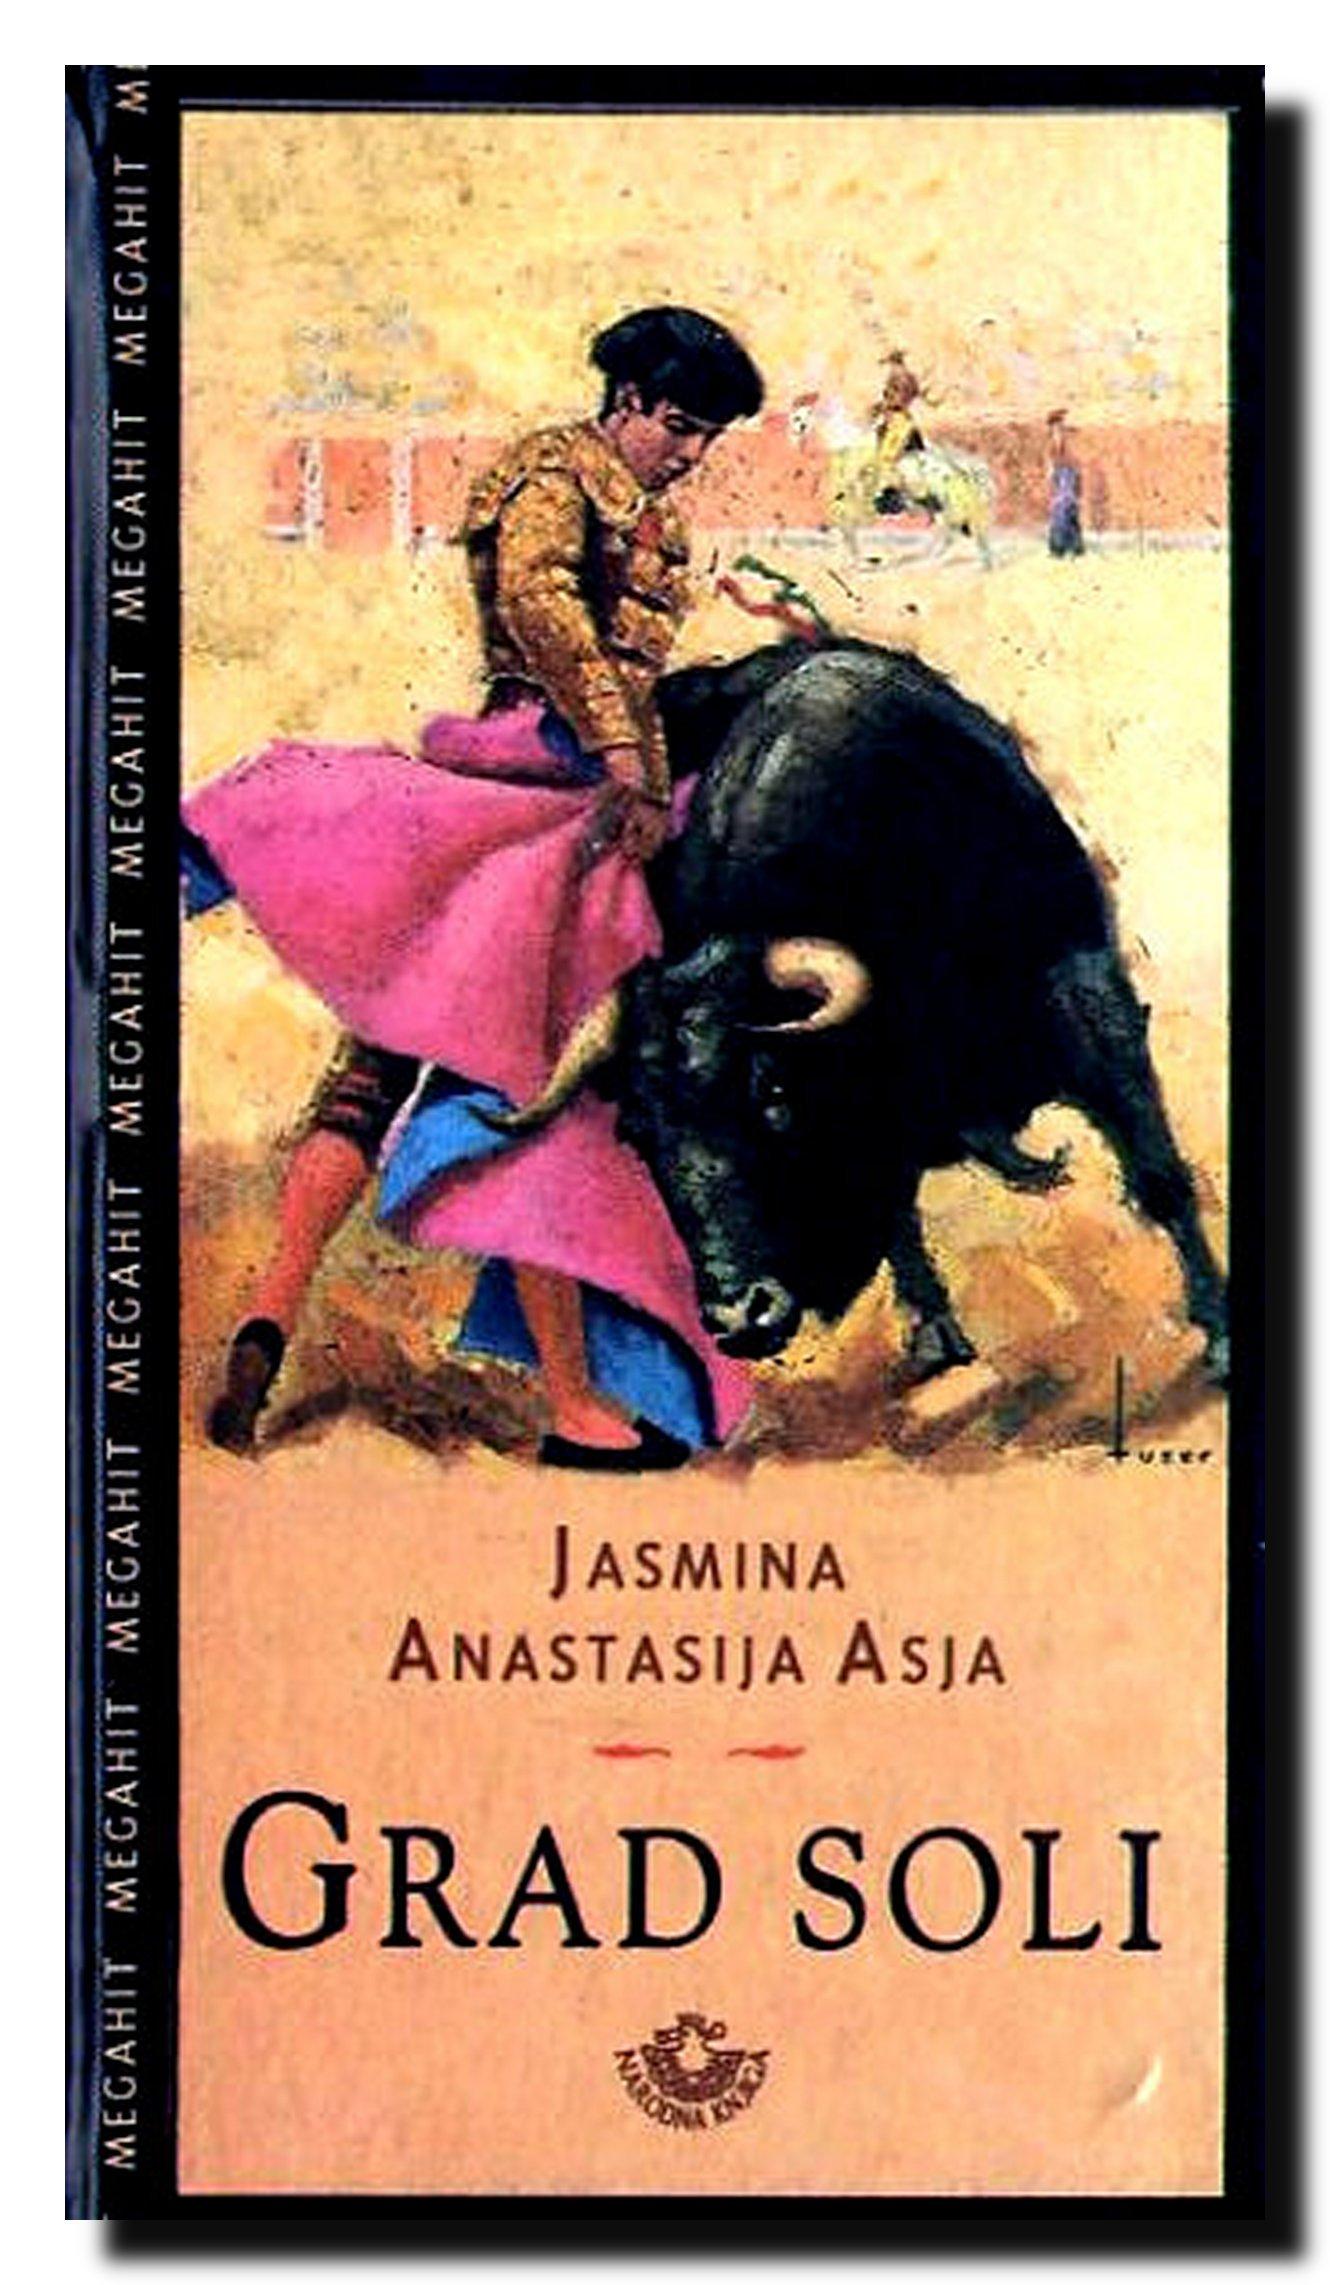 Grad soli: Jasmina Anastasija Asja: 9788633116473: Amazon ...